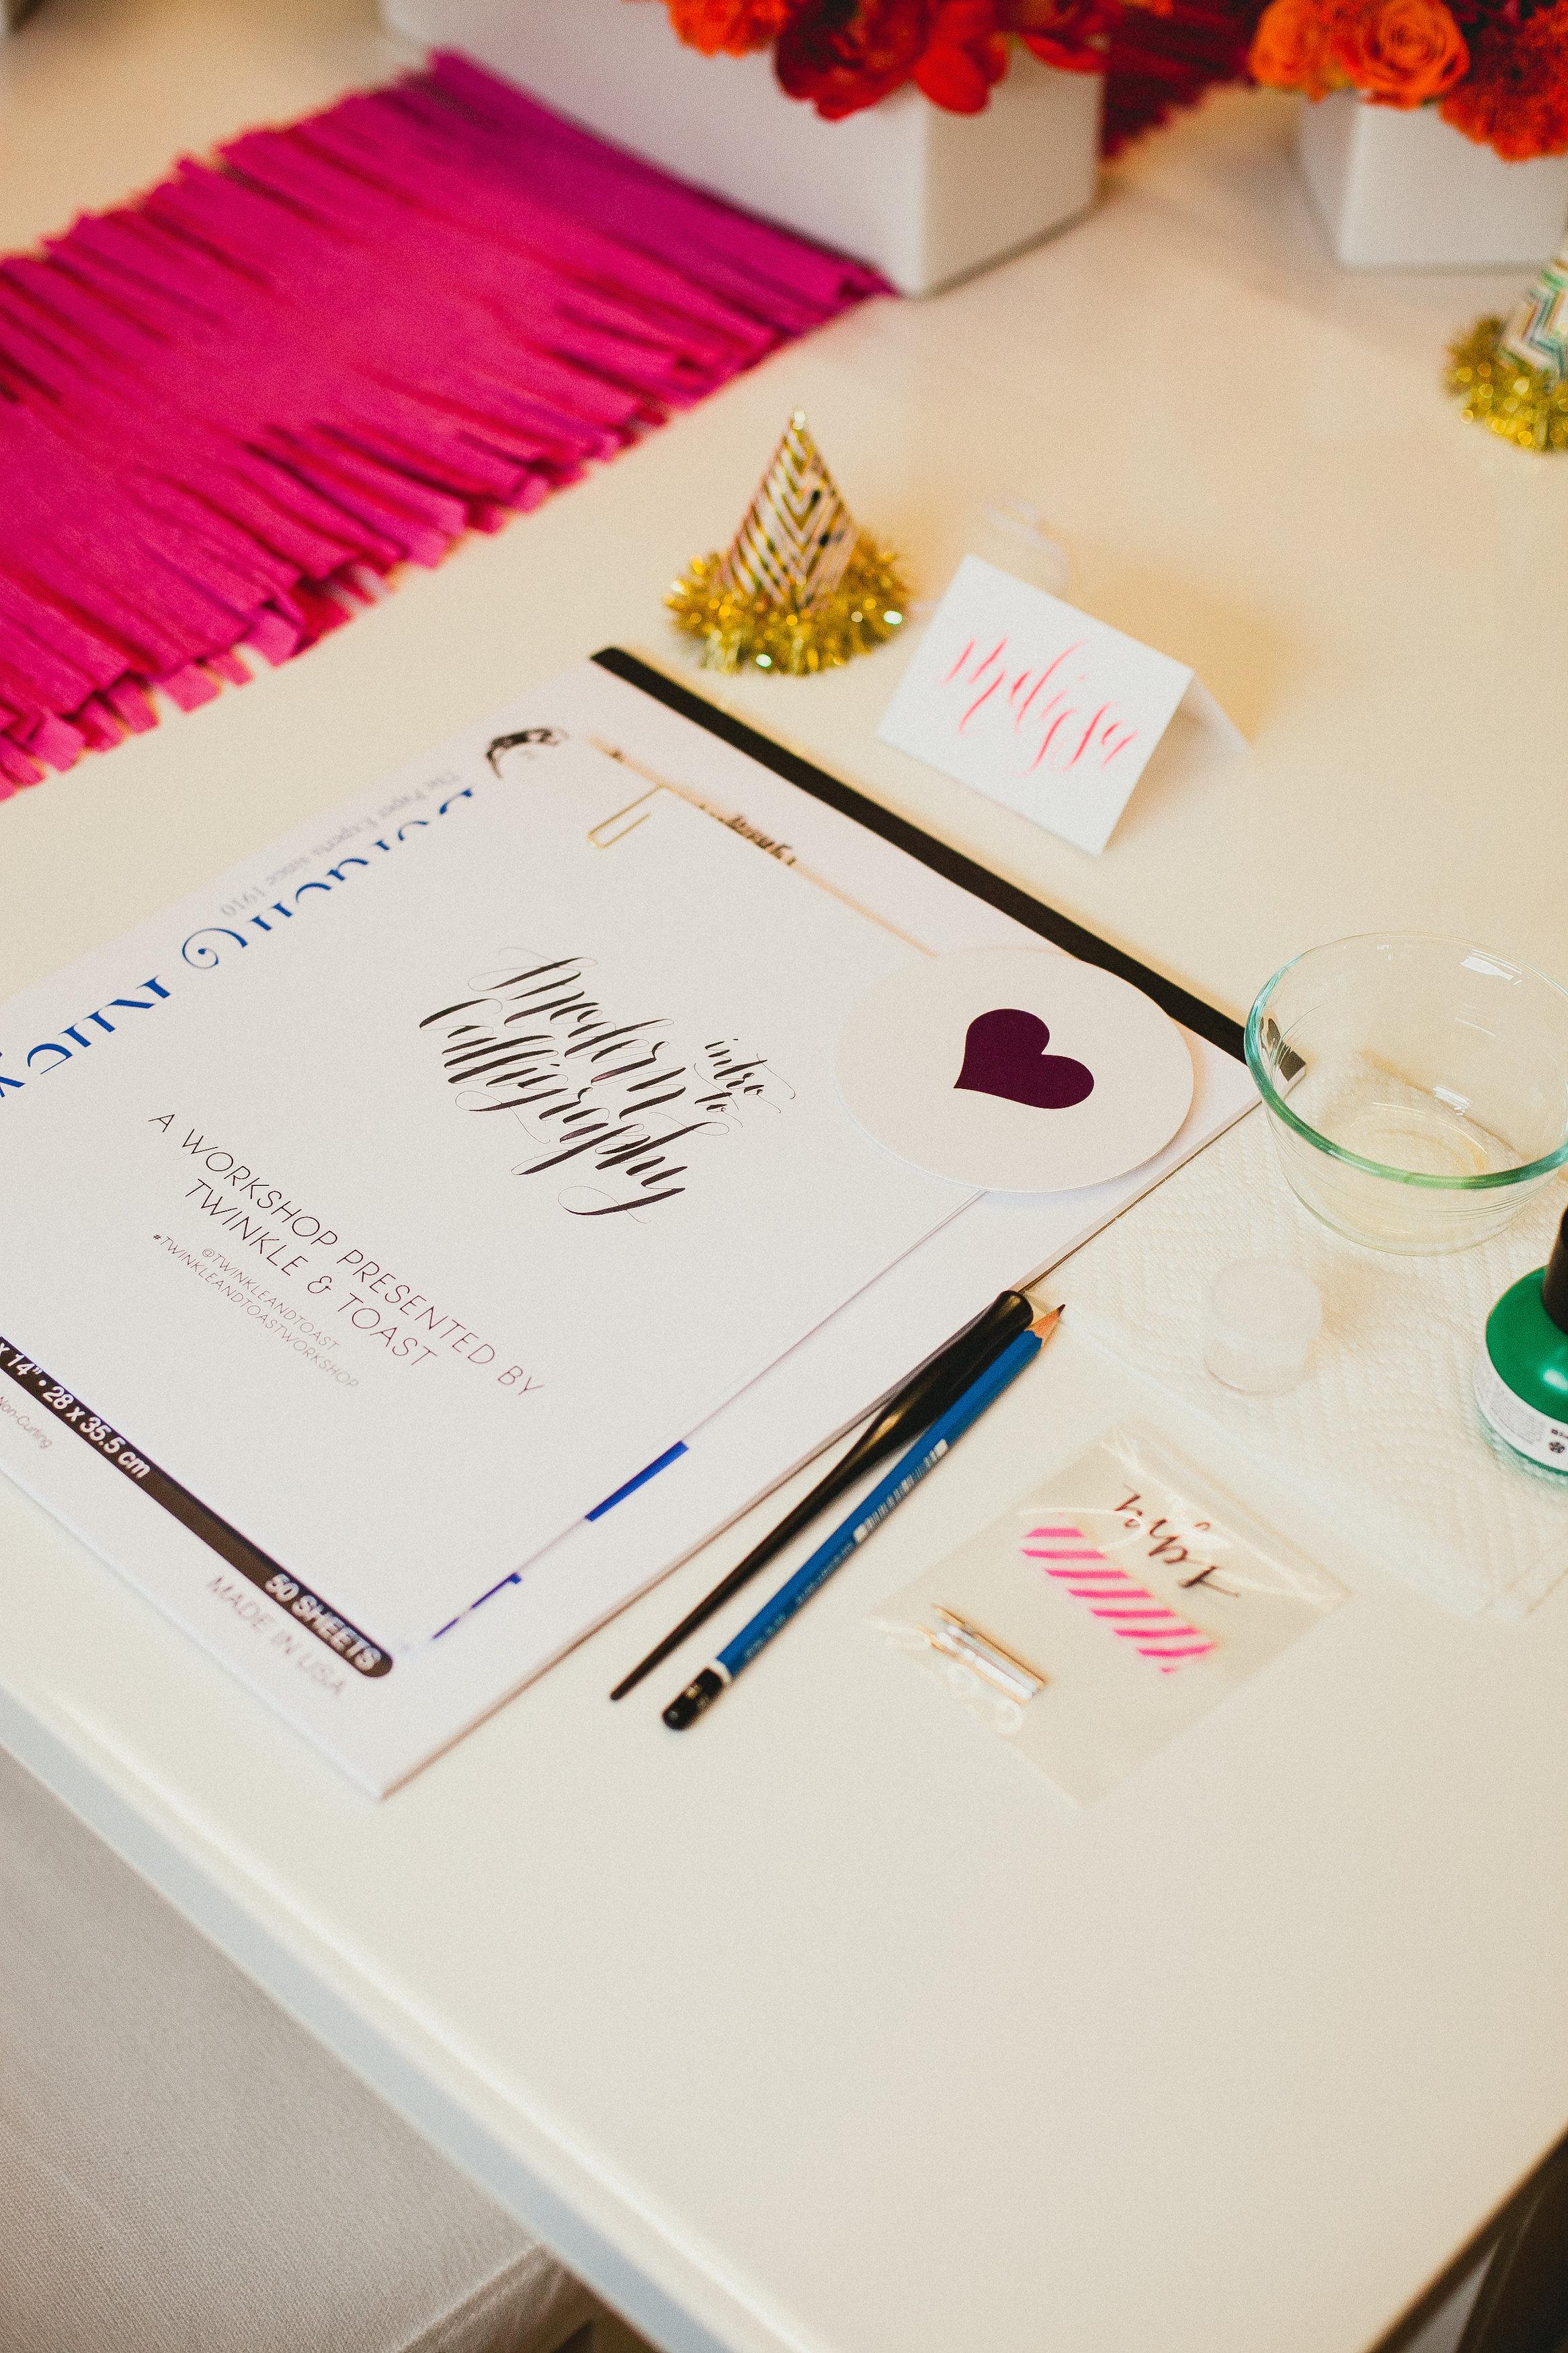 Calligraphy workshop in San Diego